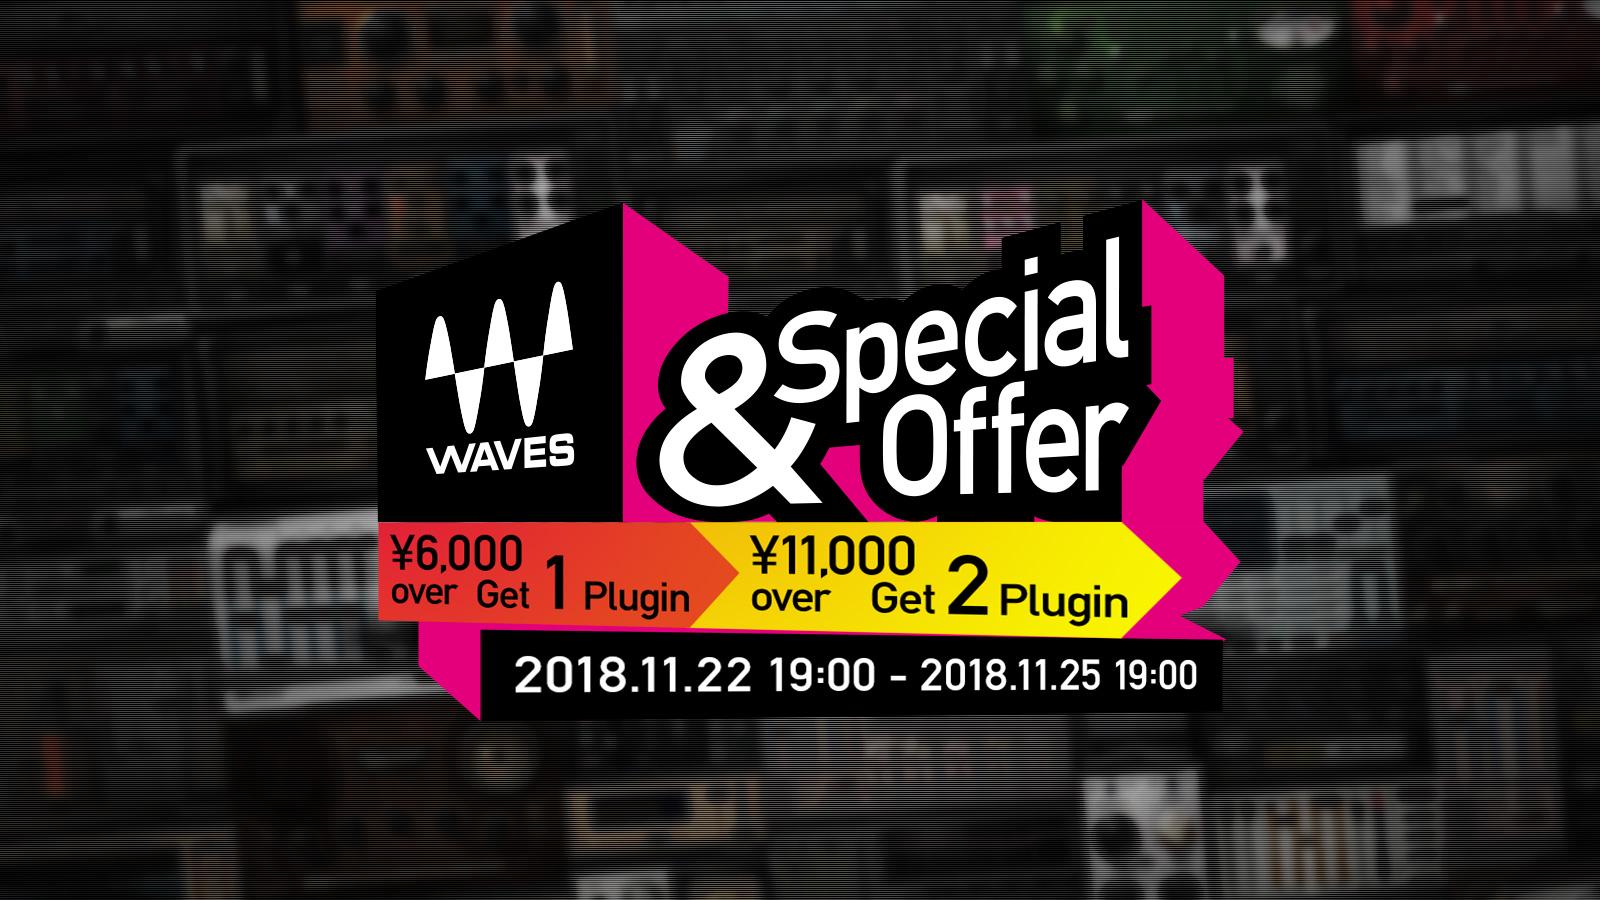 【PR】6,000円以上でお好きなプラグインが必ずもらえる! Waves ブラックフライデー・プロモーション